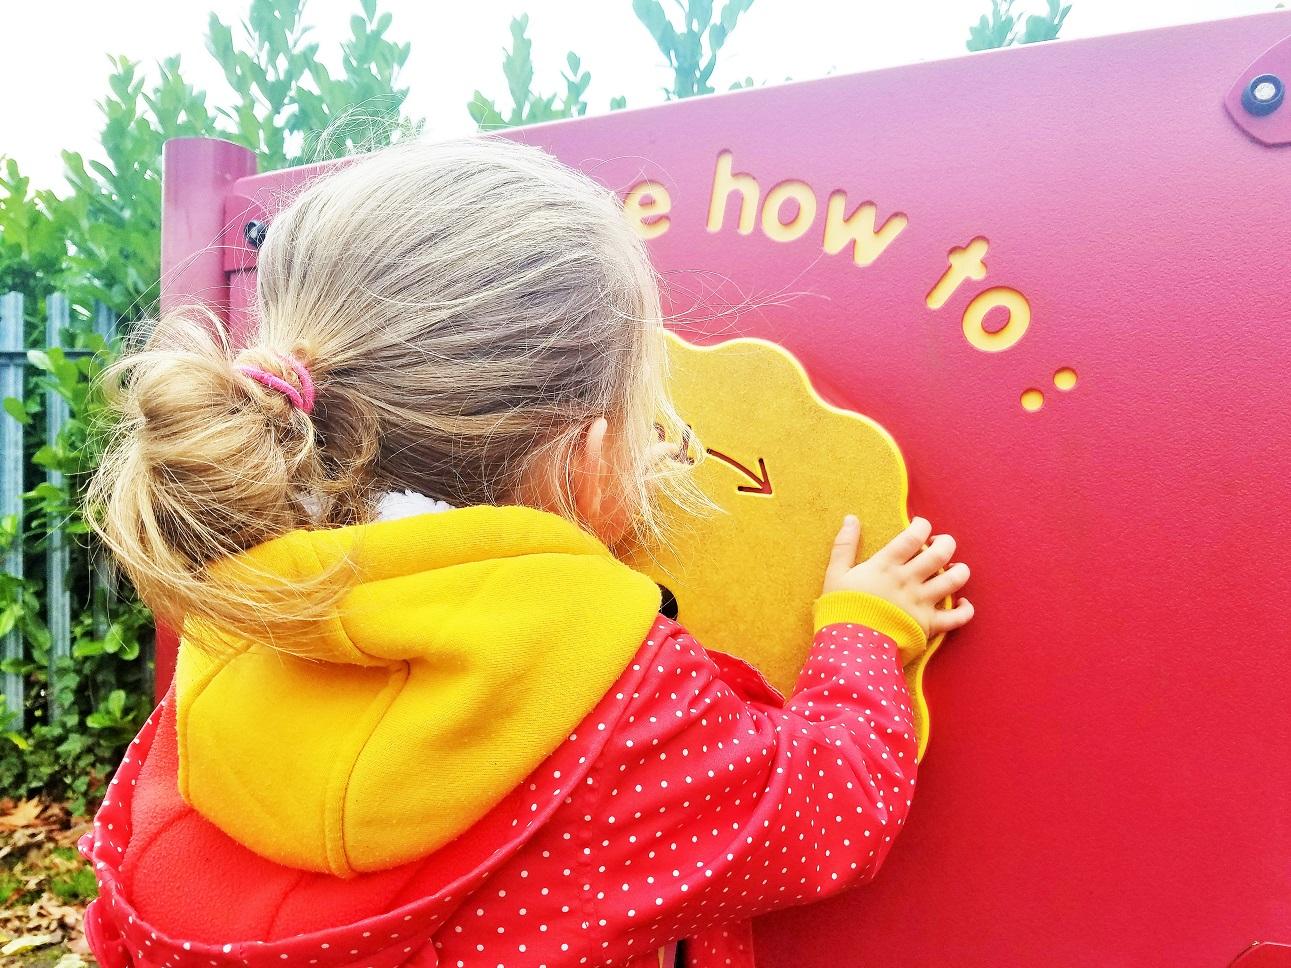 starting nursery child studying How To sign blogcrush week 37